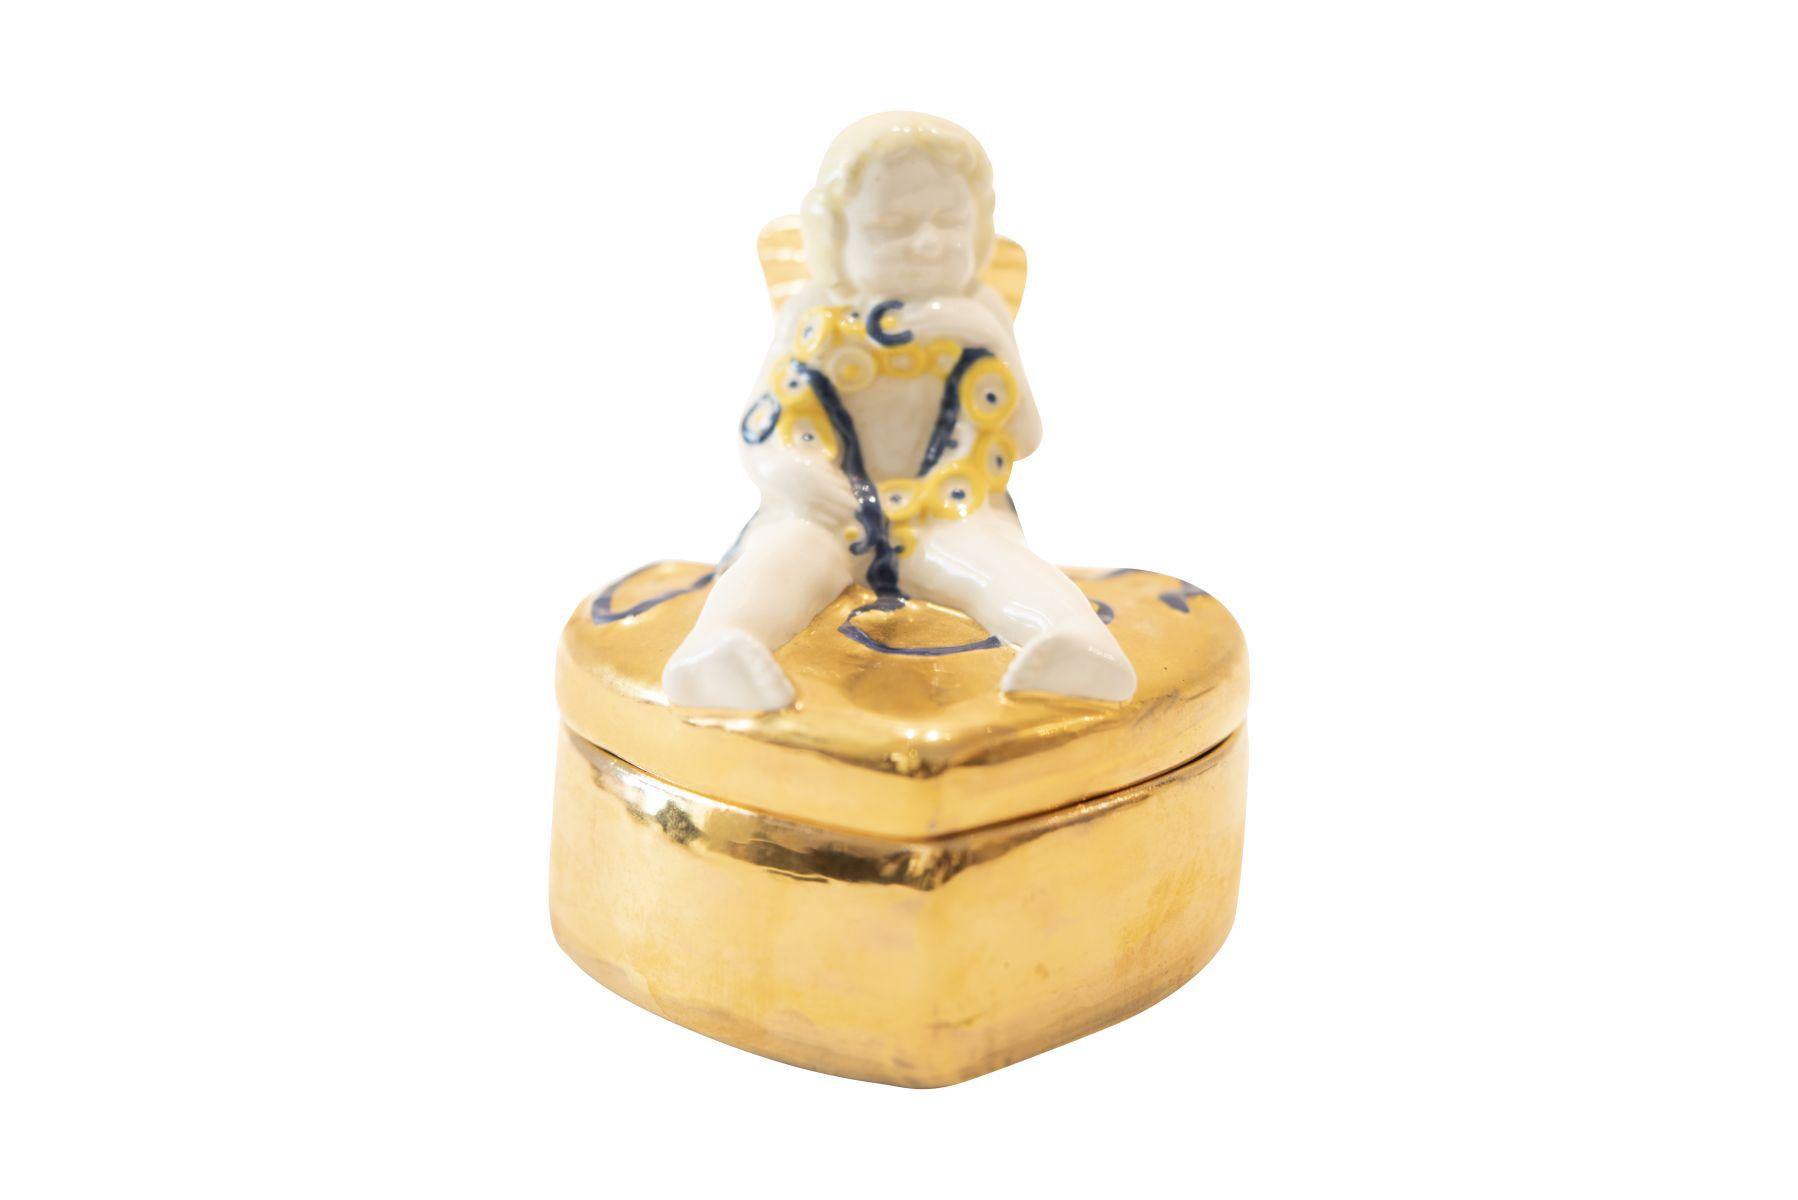 #176 Gmundner Ceramics, Heart Box with Cupid, Around 1907   Gmundner Keramik, Herzdose mit Amor, um 1907 Image